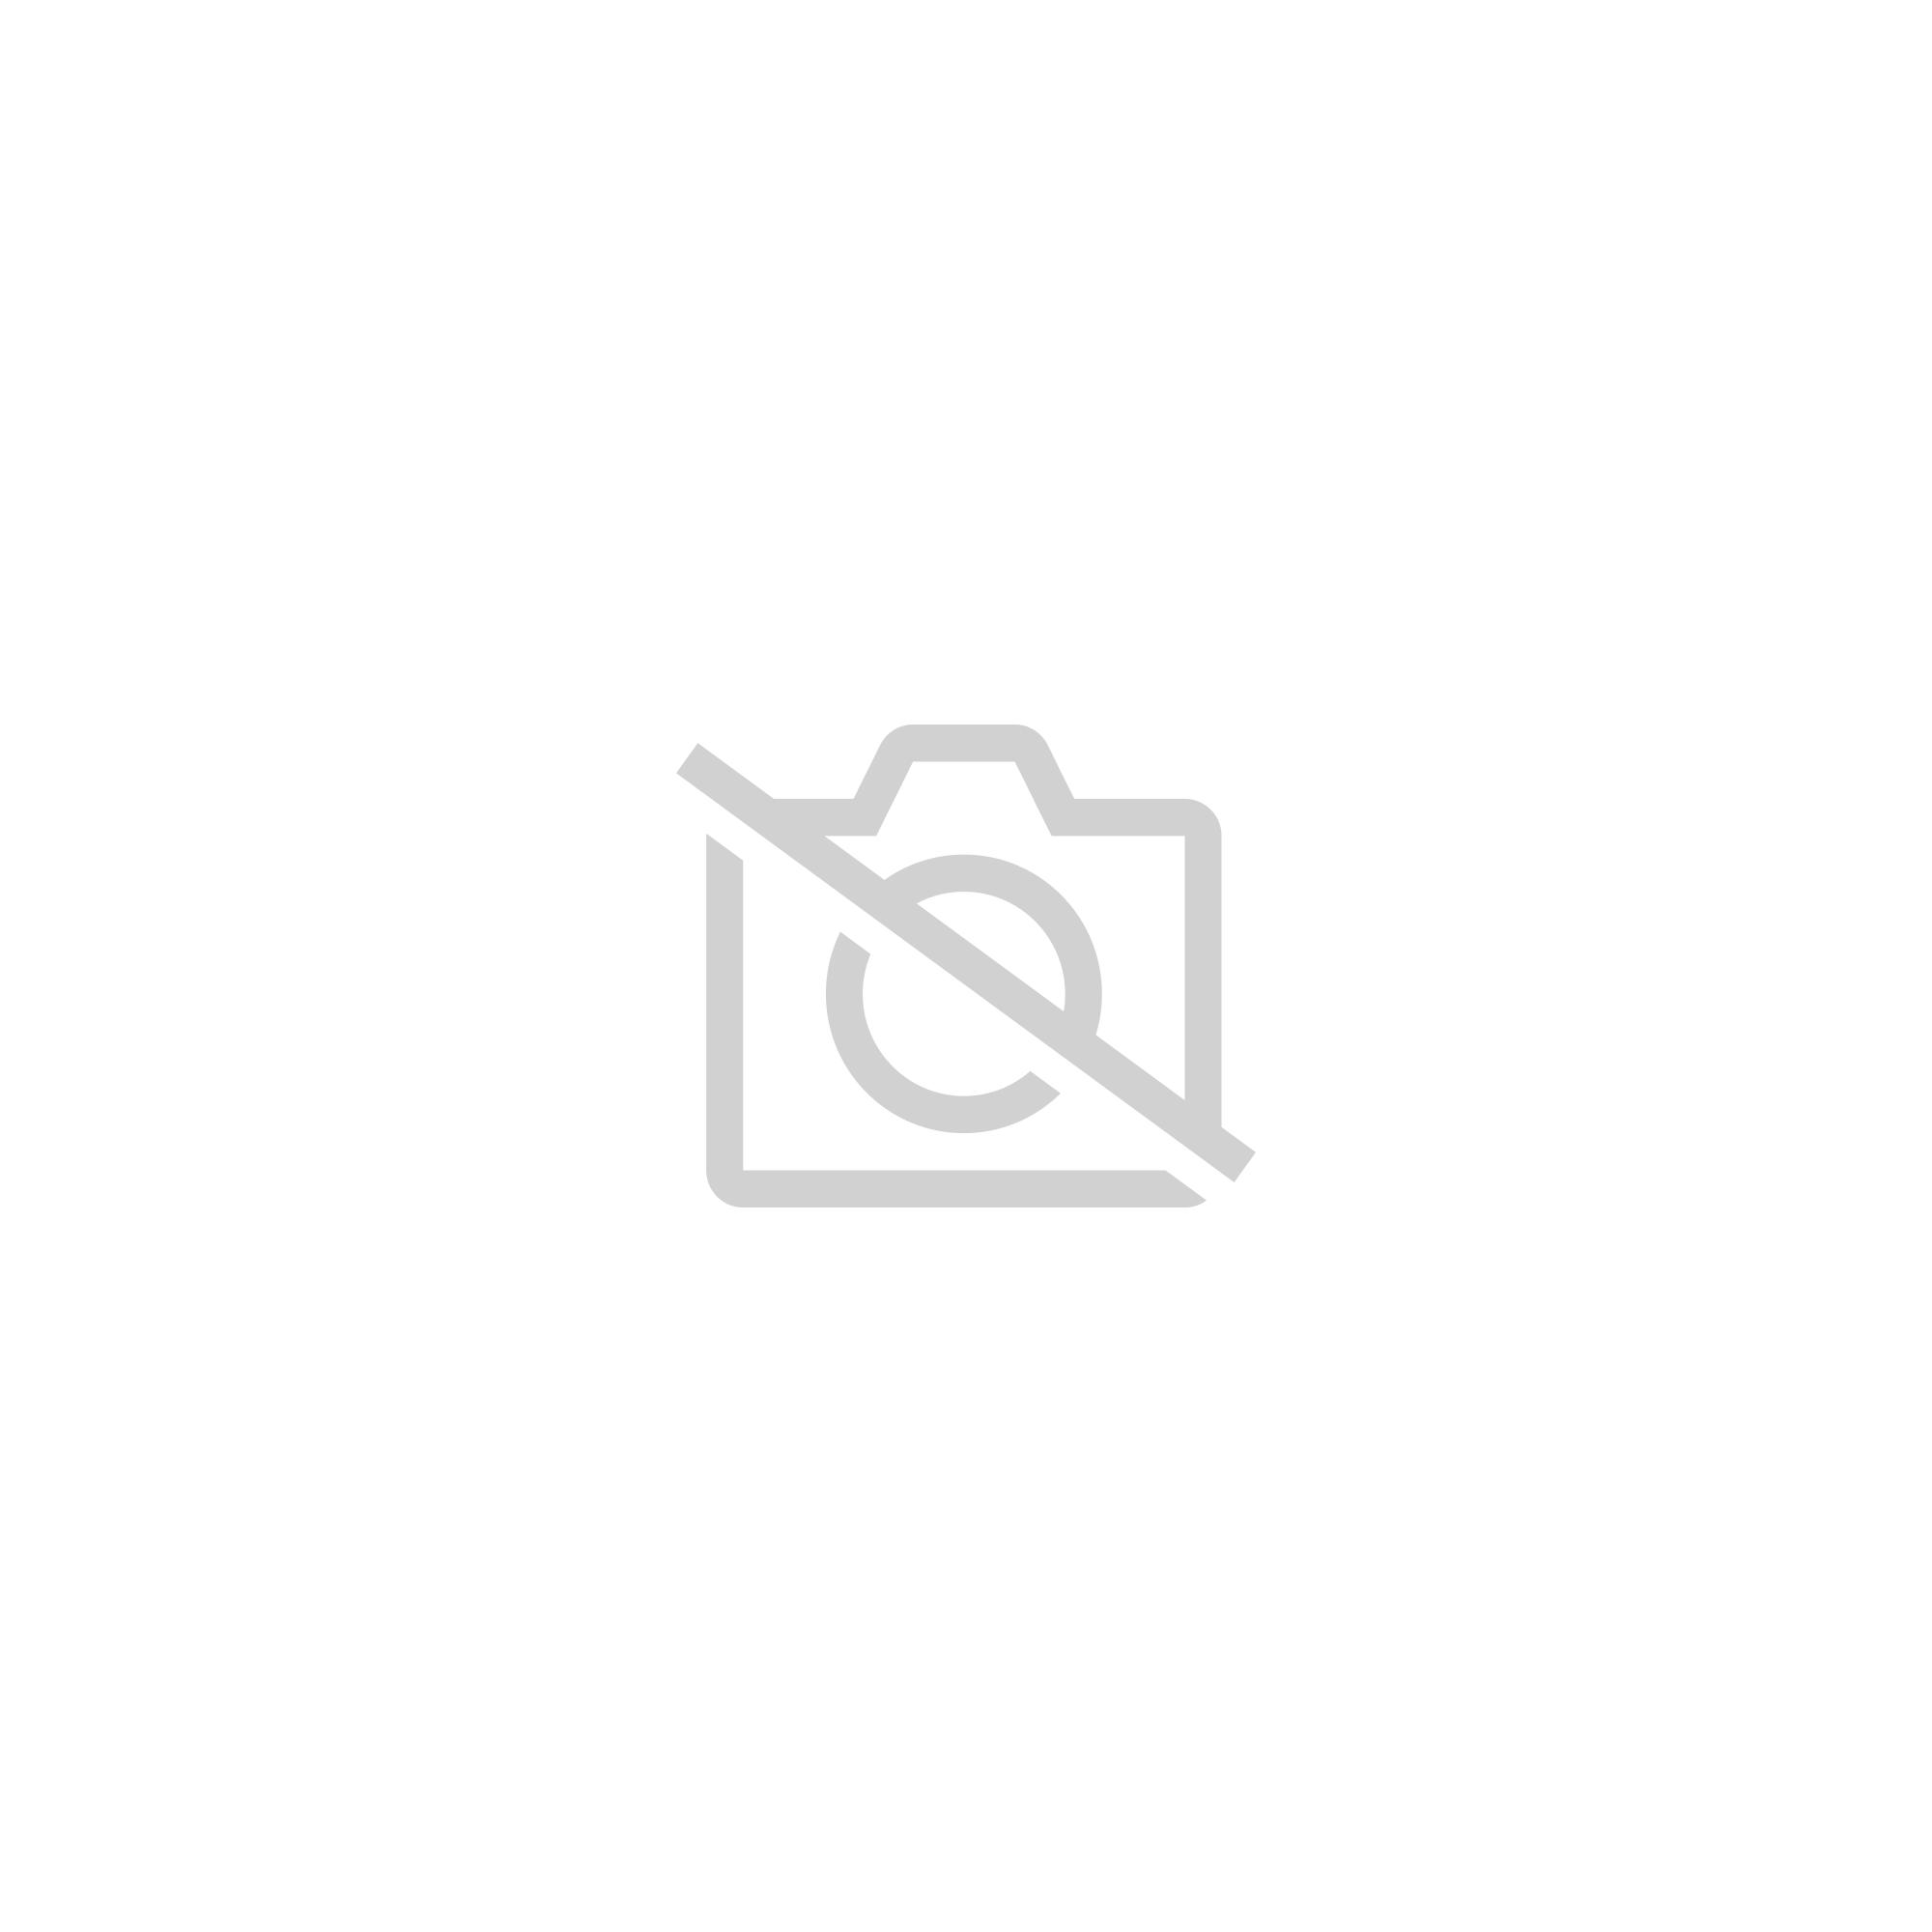 Set De 3 Protections Taille S